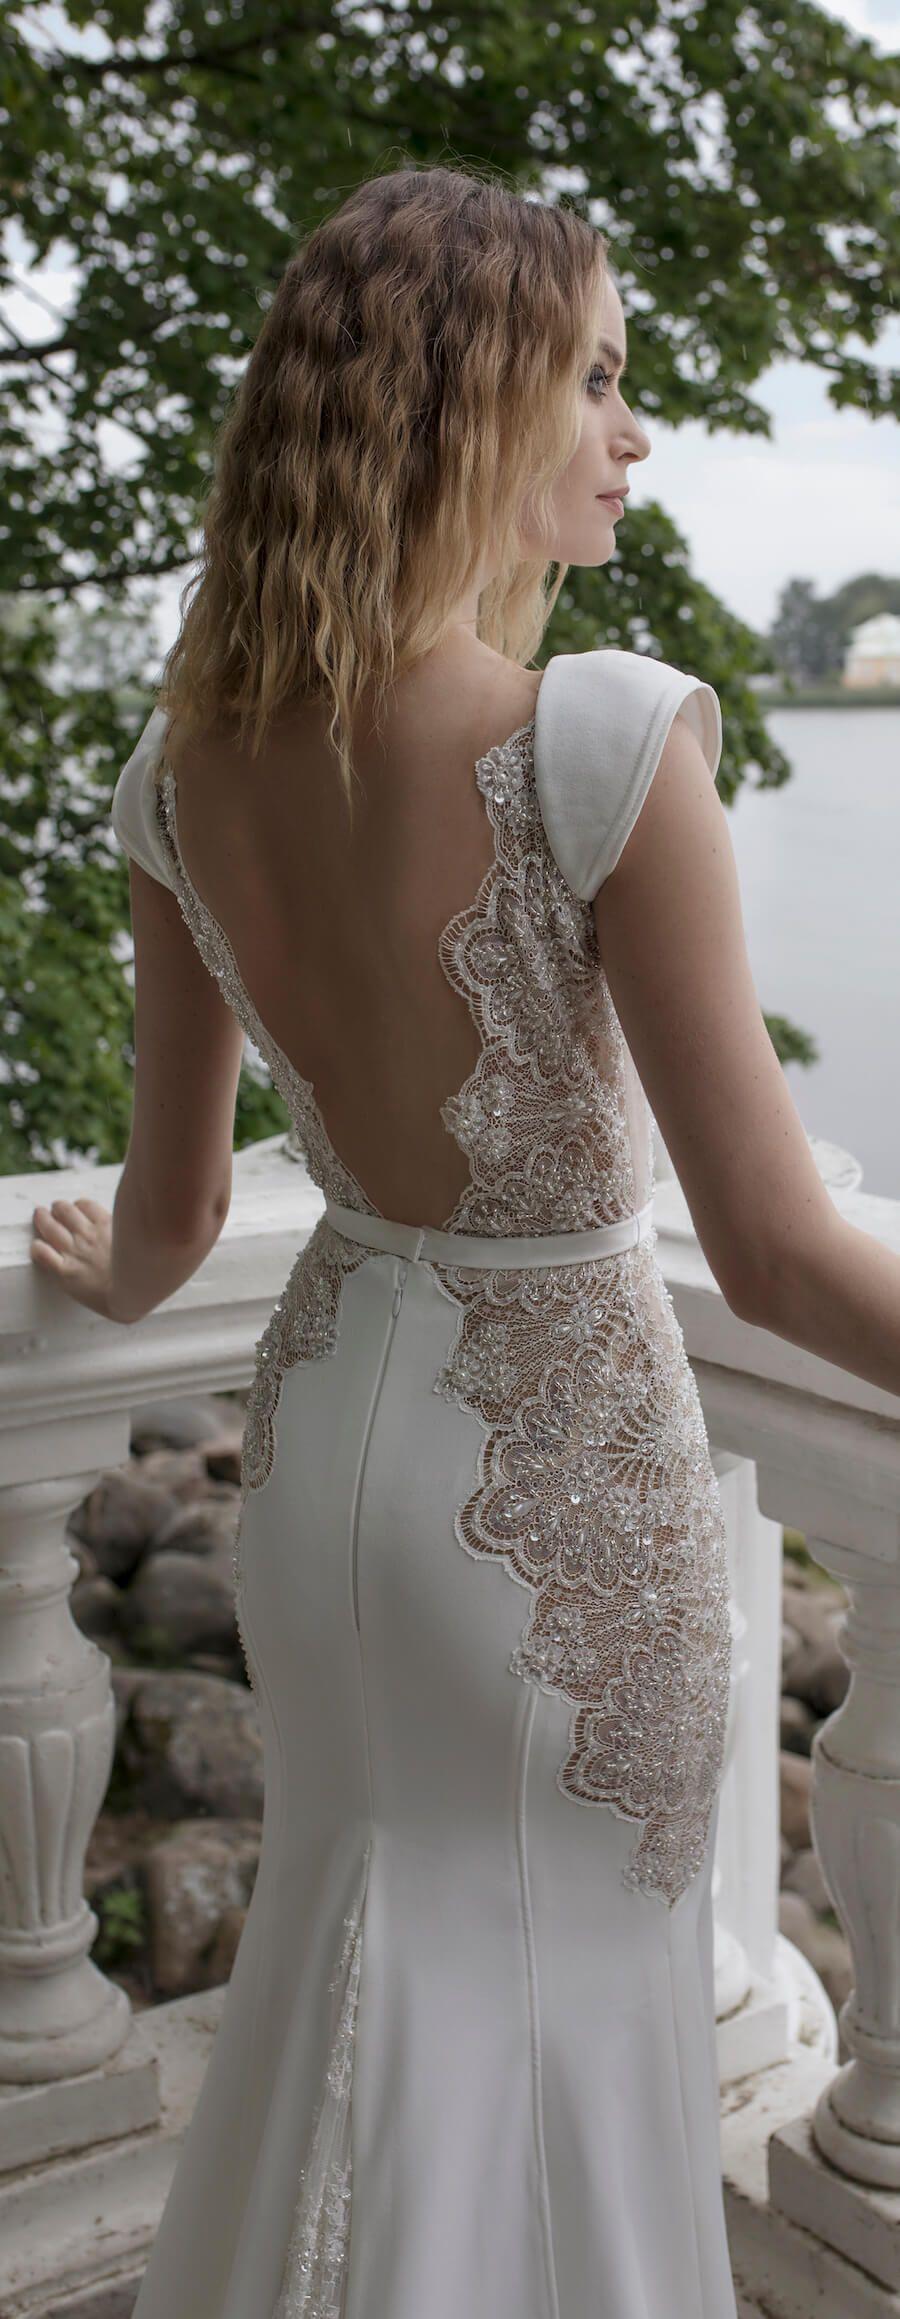 Lian Rokman Wedding Dress 2018 - Stardust Bridal Collection -Pavo4 ...